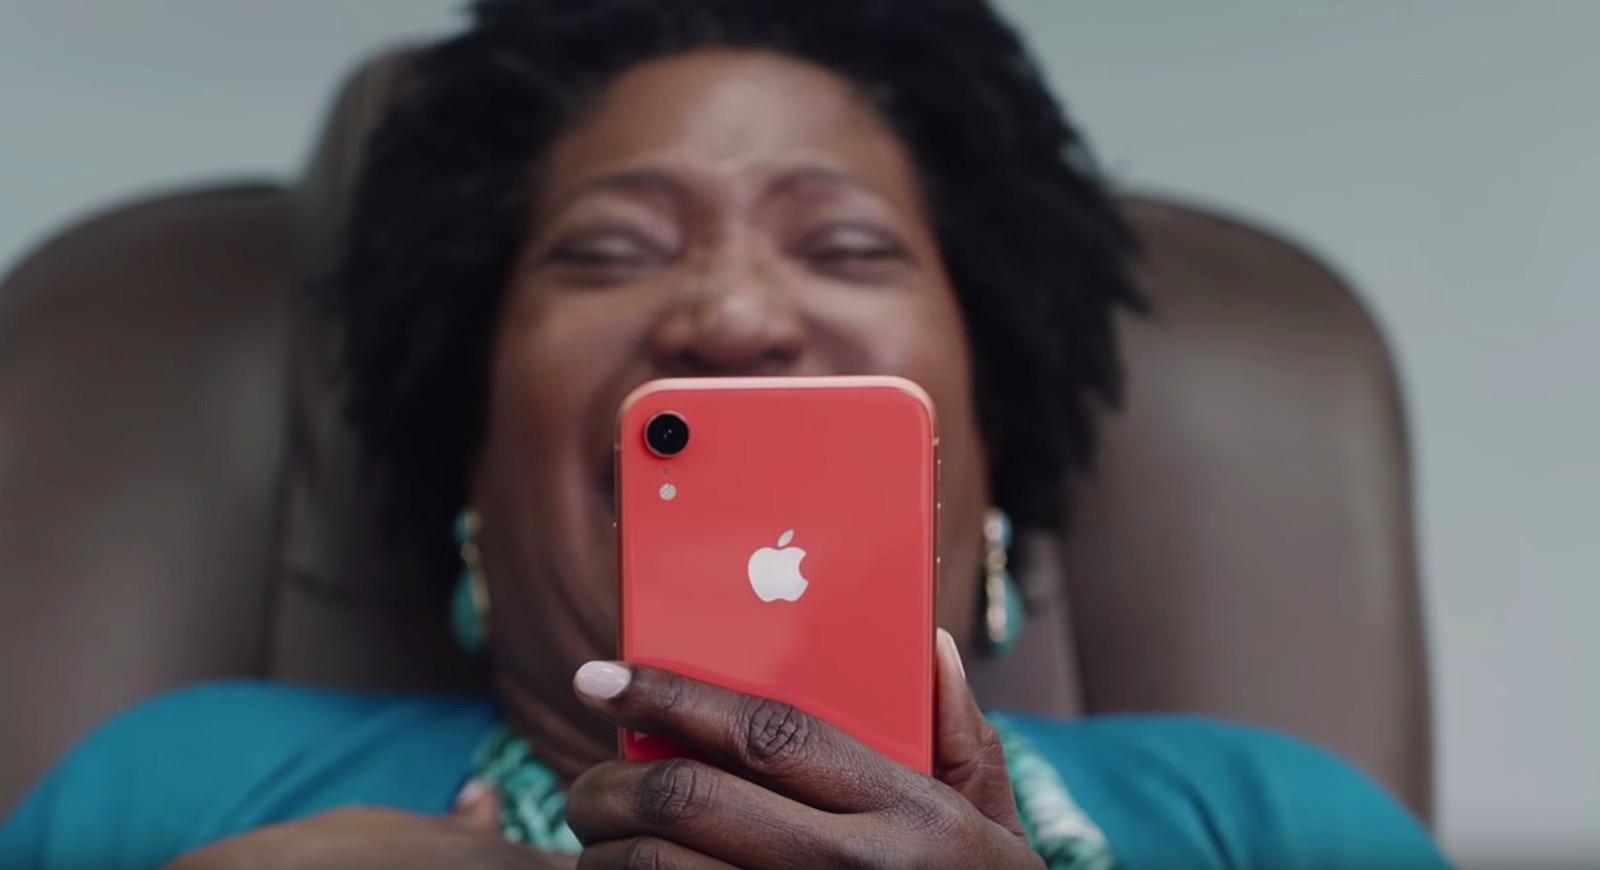 Laughing-Lady-iPhone-XR.jpg